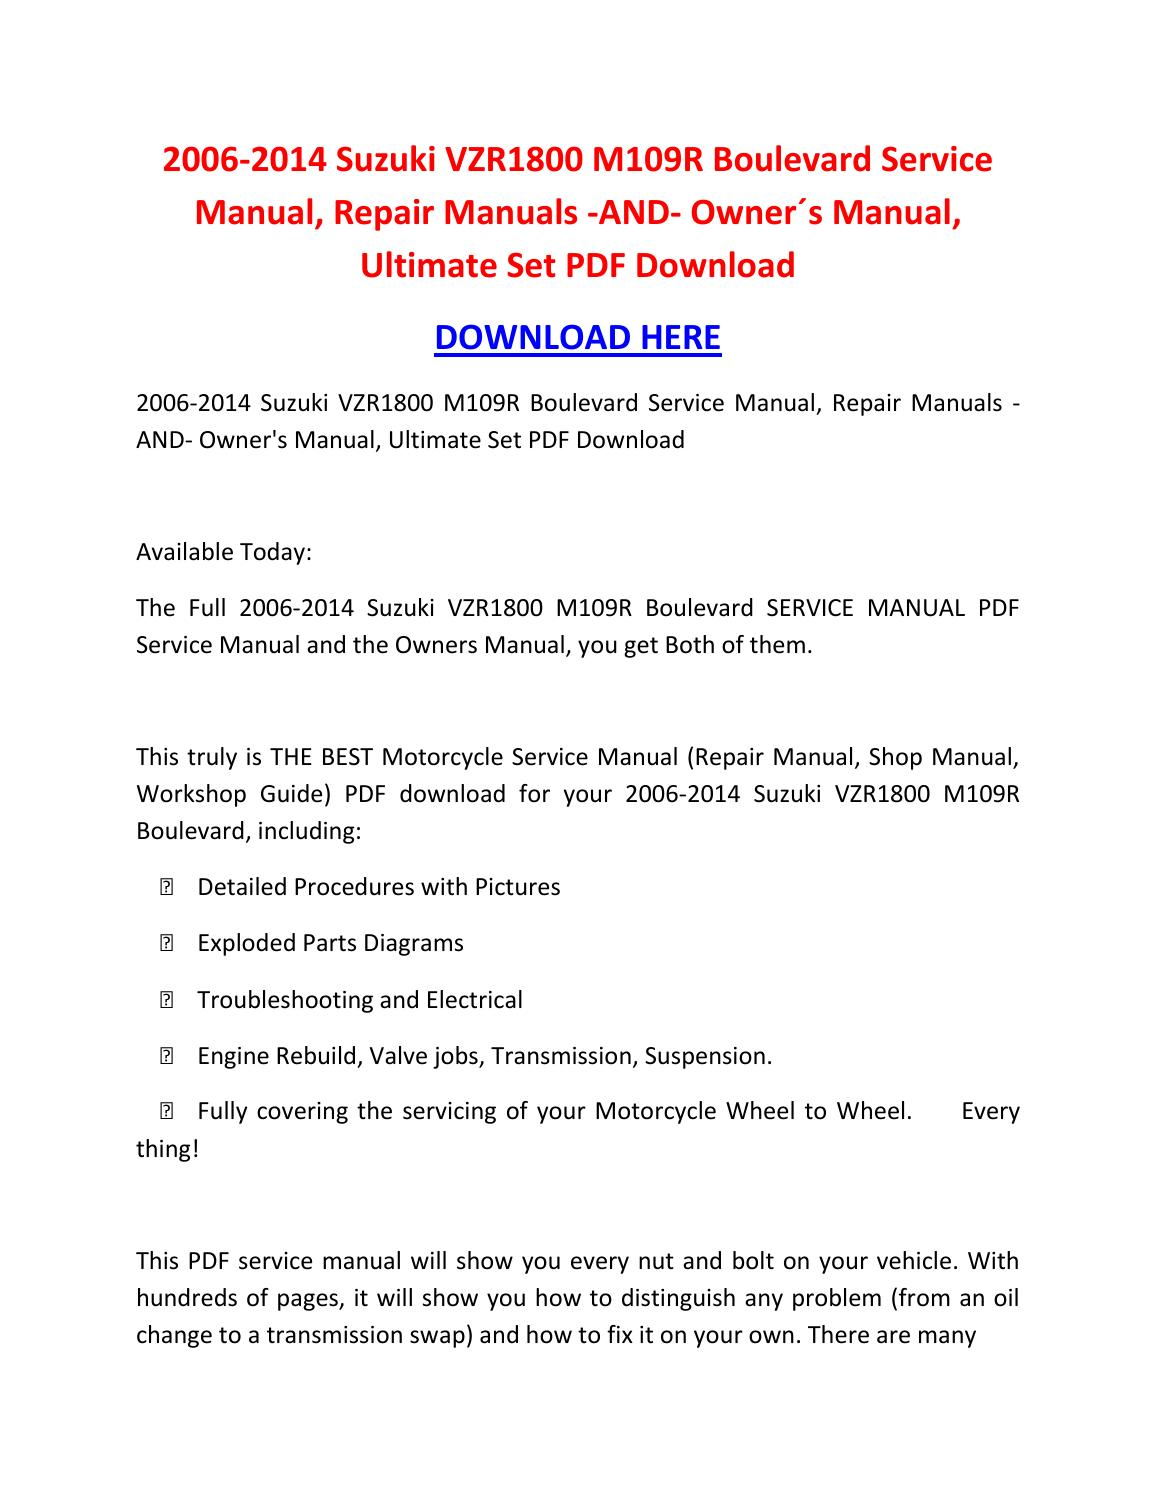 2007 suzuki boulevard m109r owners manual pdf